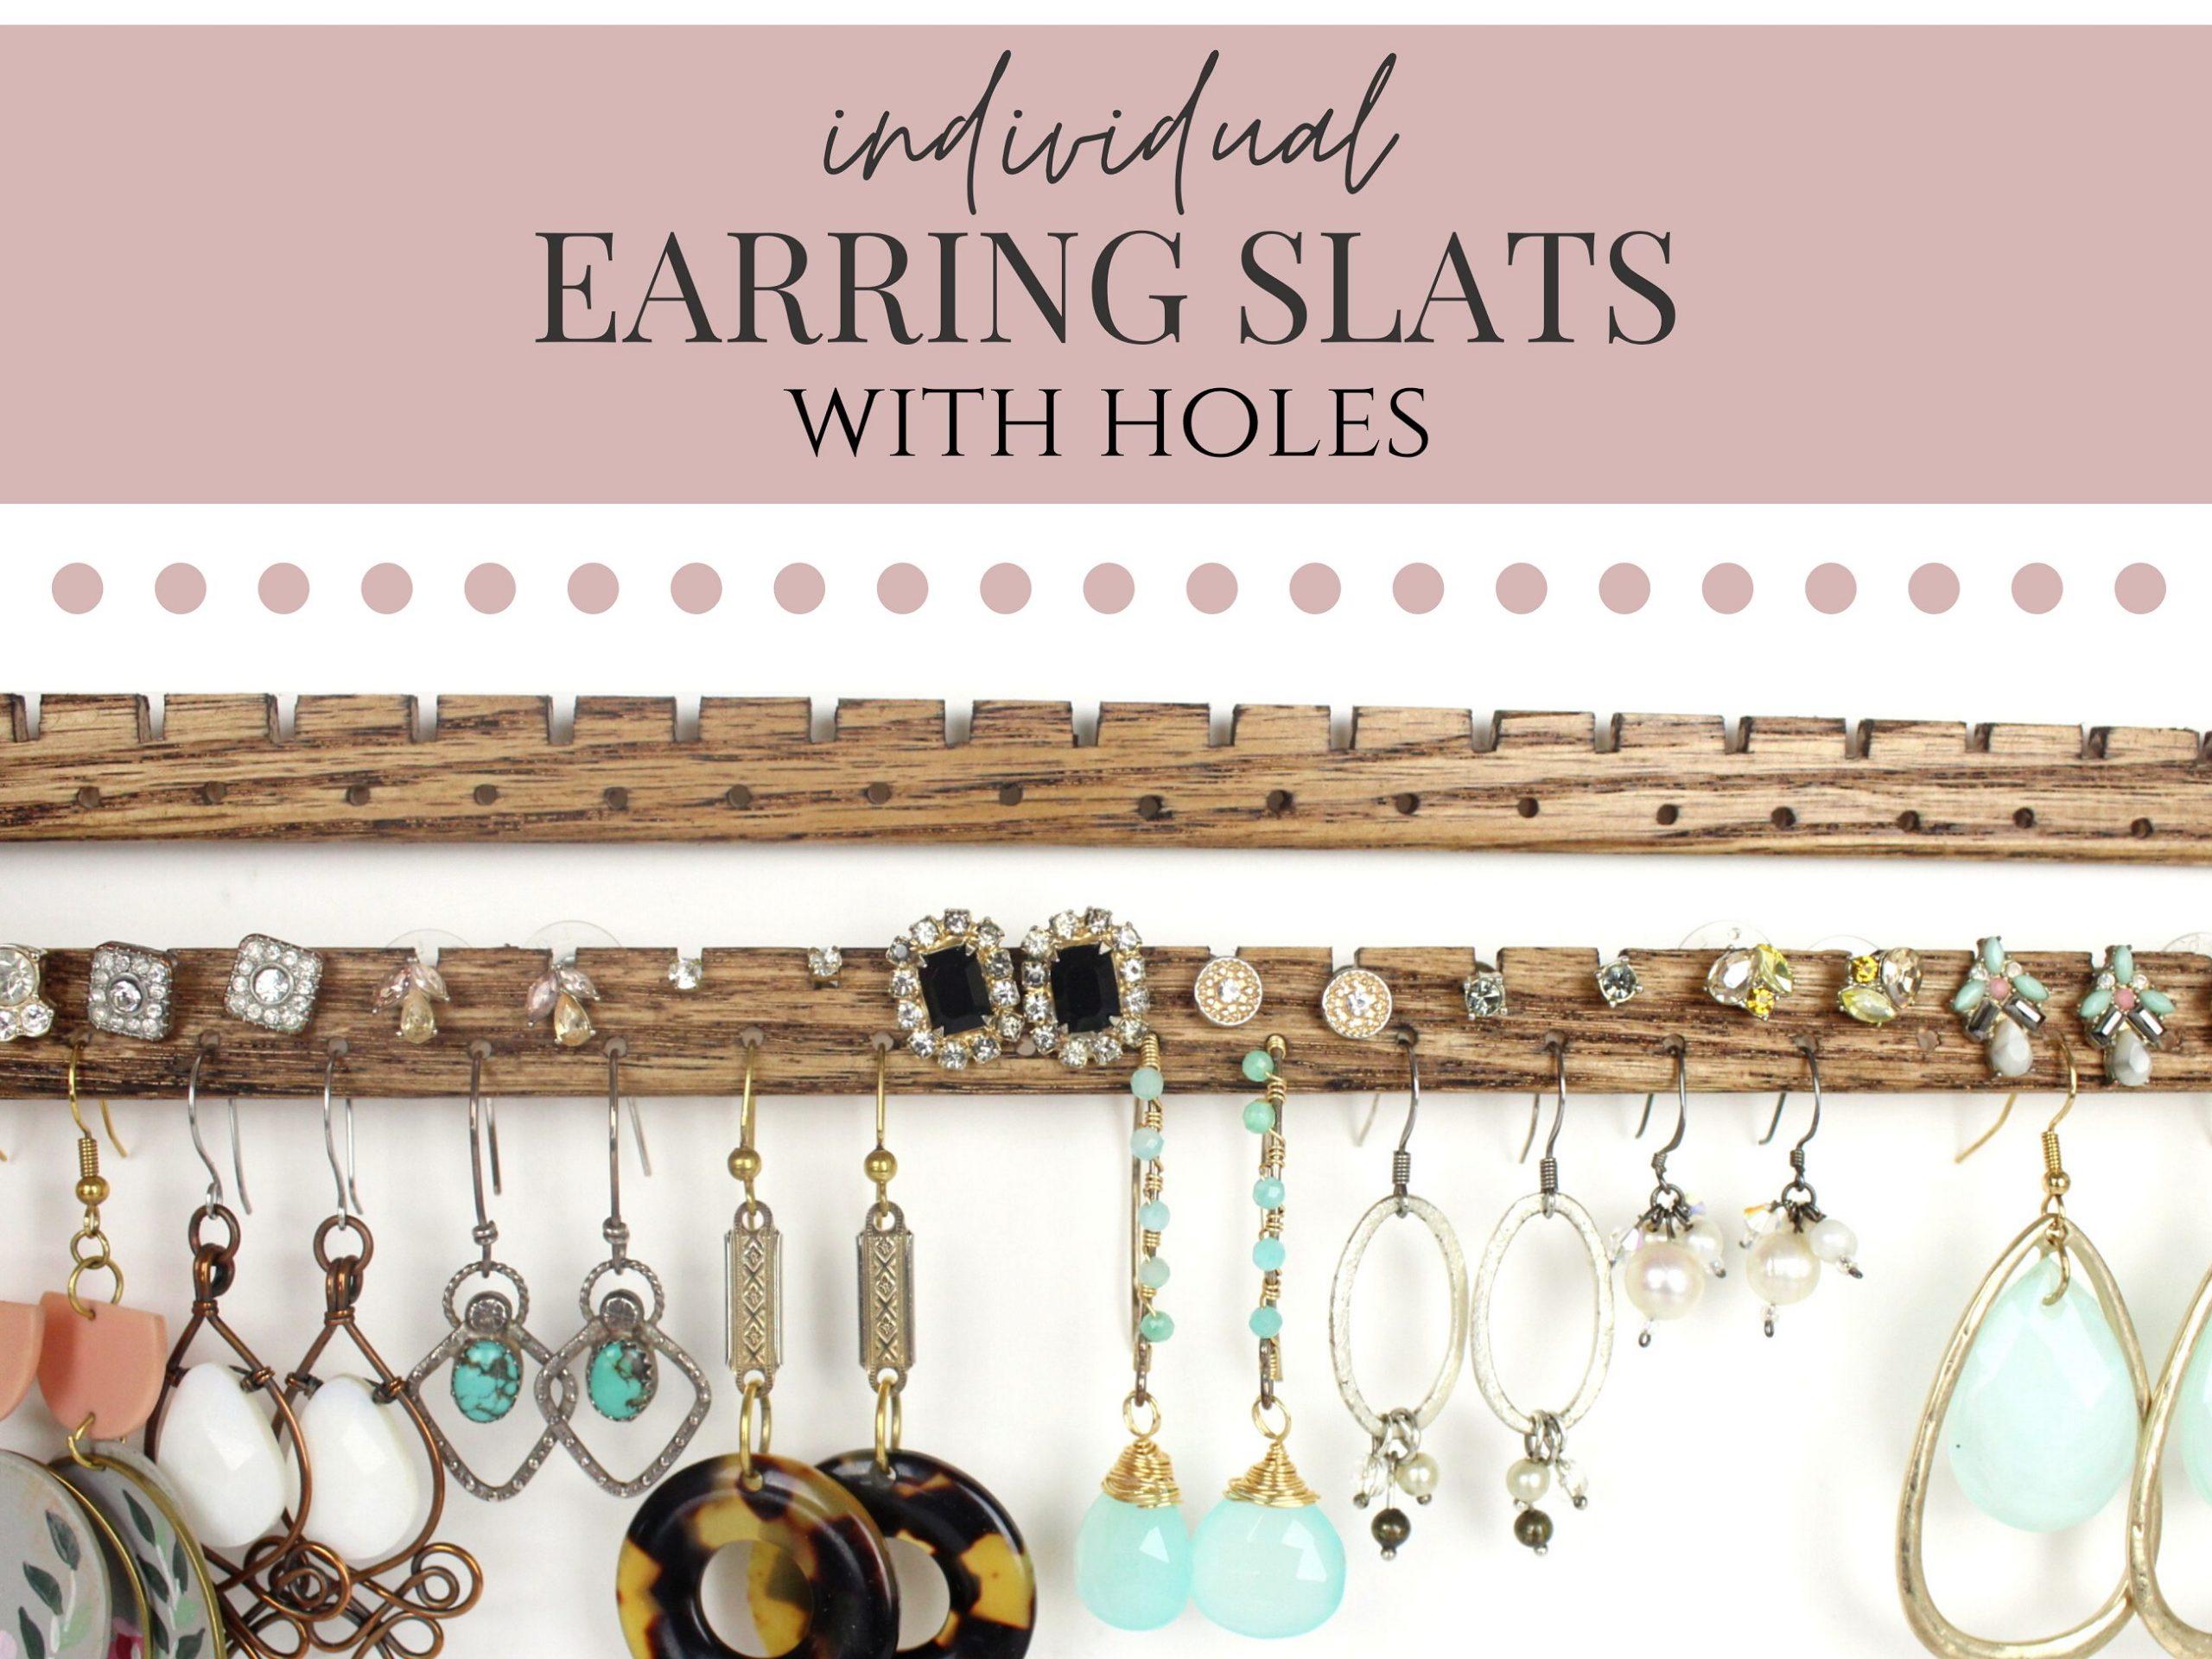 Earring Slats with Holes